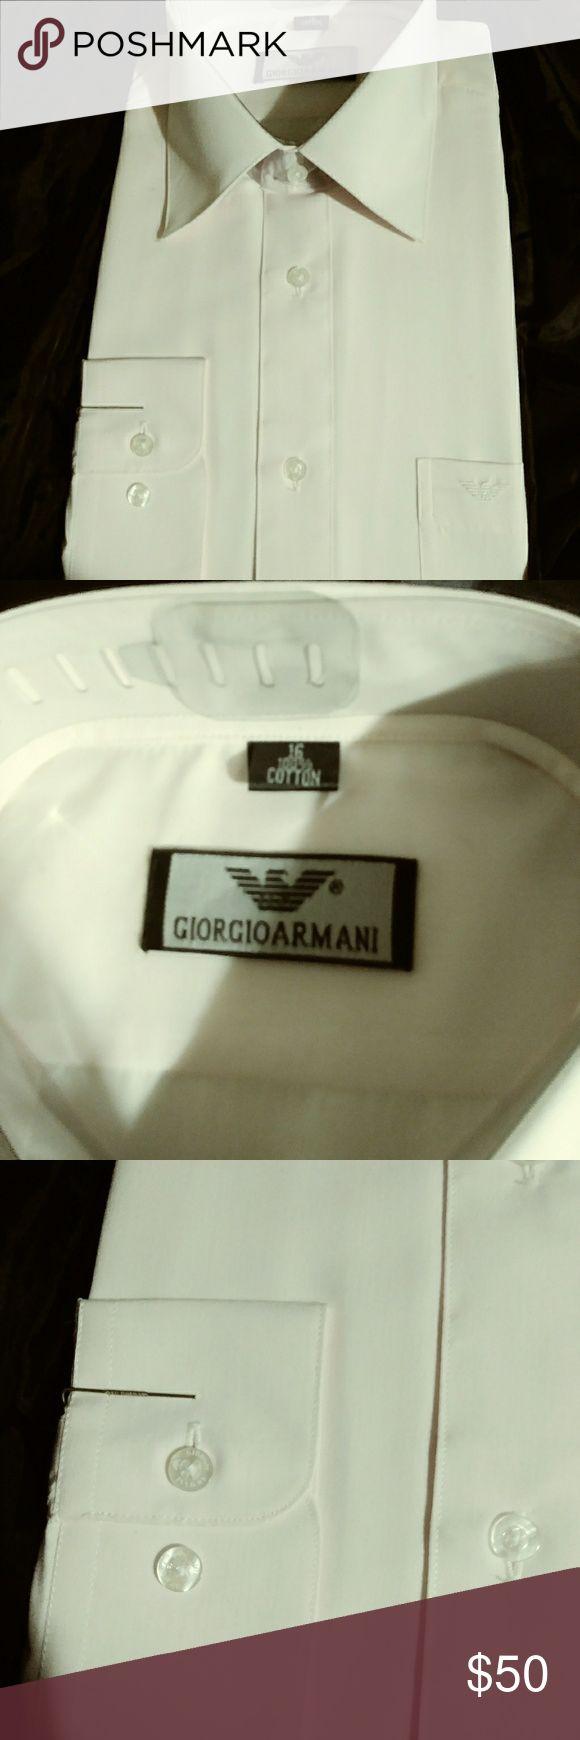 New Giorgio Armani size 16 pink shirt. Giorgio Armana size 16 mens shirt.  Long sleeve. Light Pink. Giorgio Armani Shirts Dress Shirts